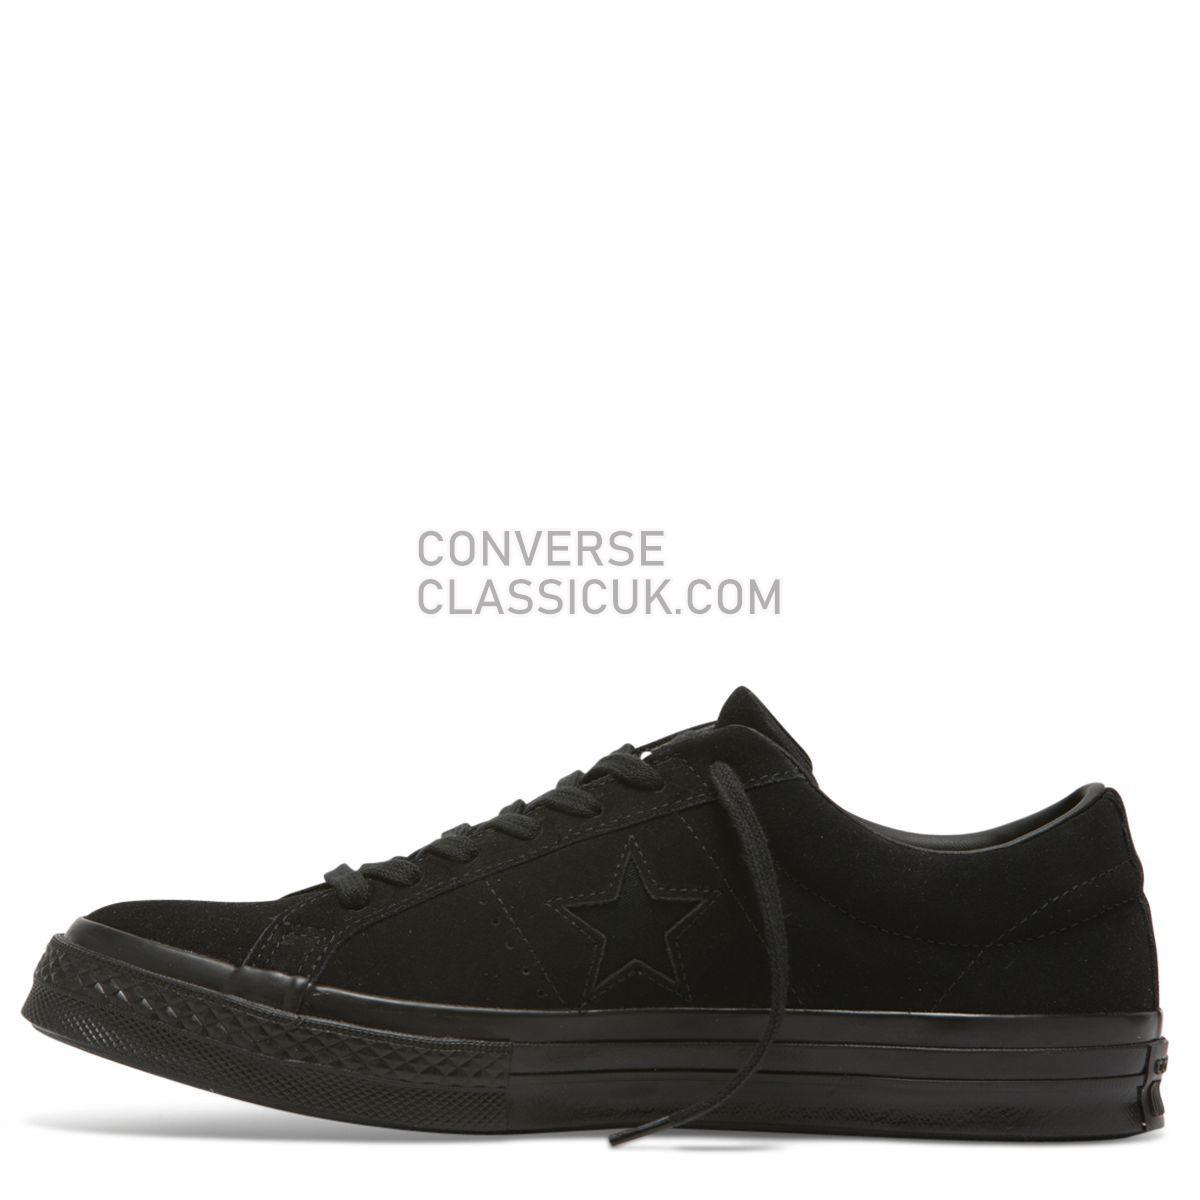 Converse One Star Suede Low Top Black Mono Mens Womens Unisex 162950 Black/Black/Black Shoes